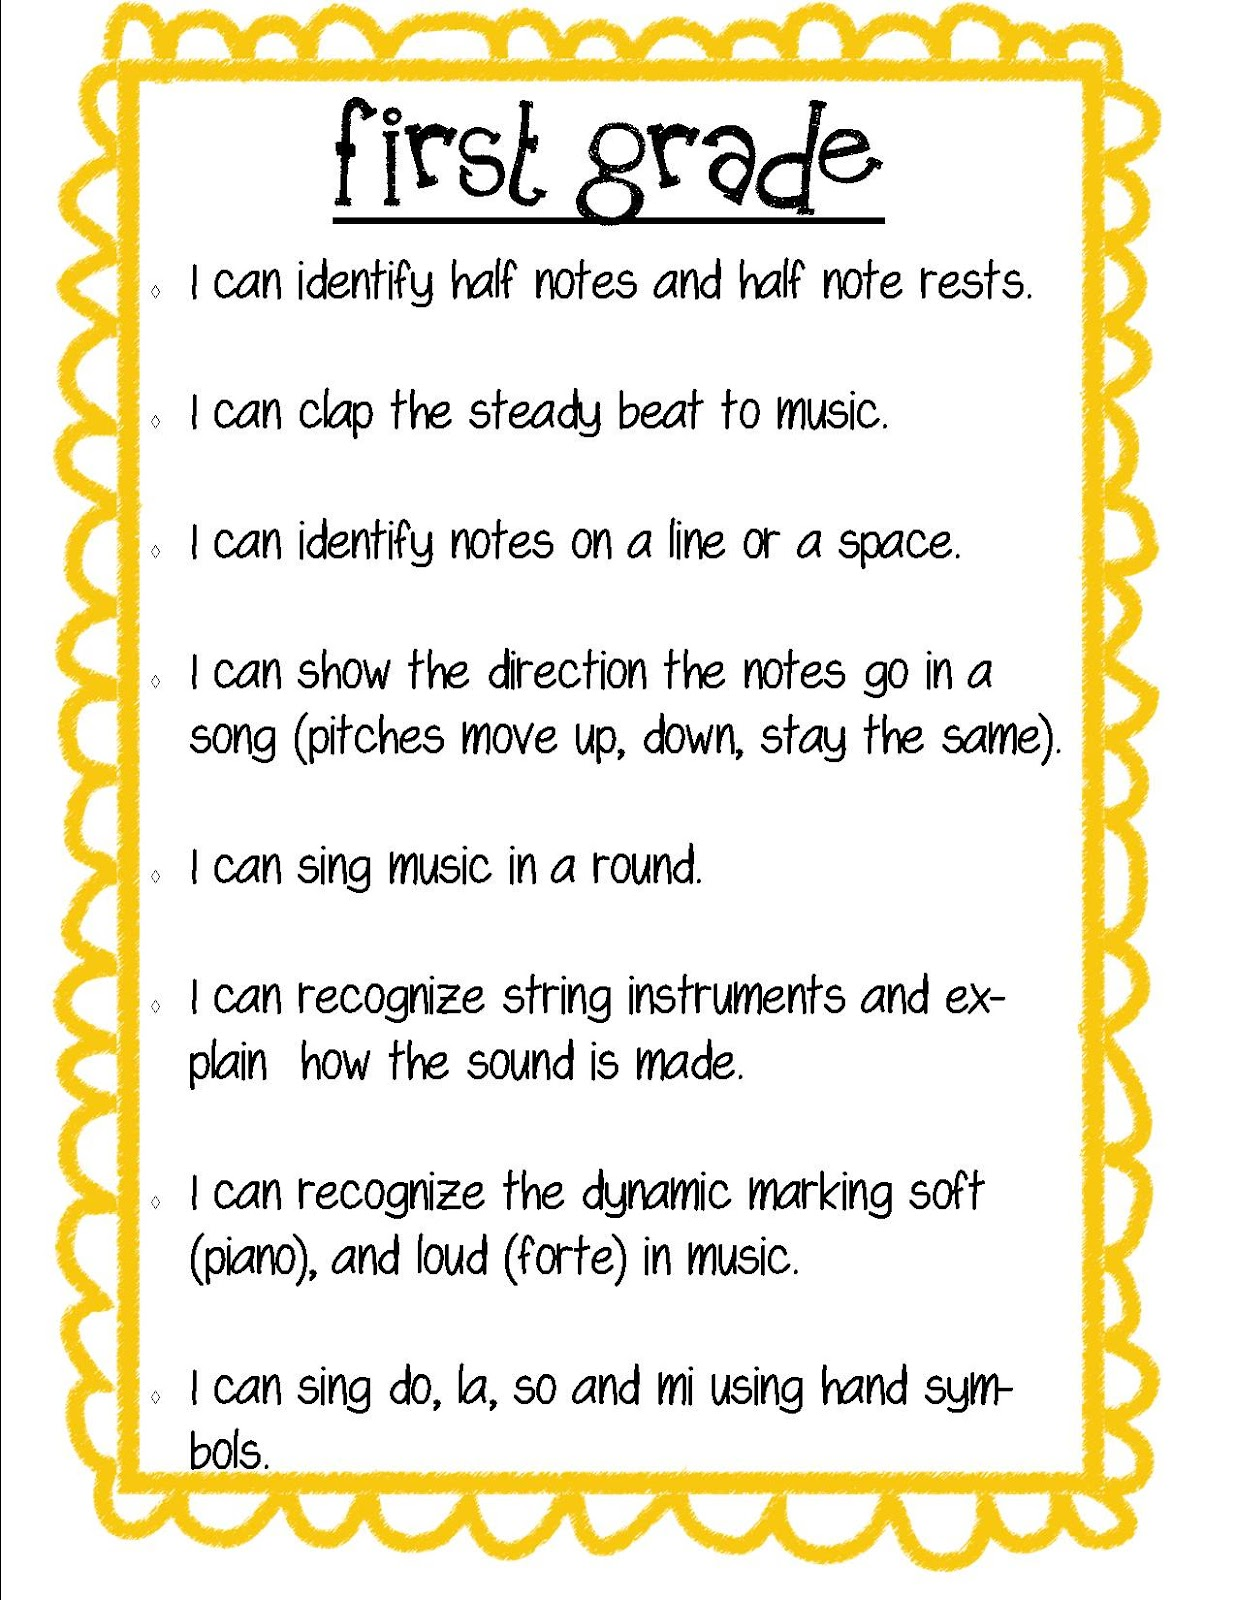 Worksheet. Short Stories For 1st Grade. Wosenly Free Worksheet